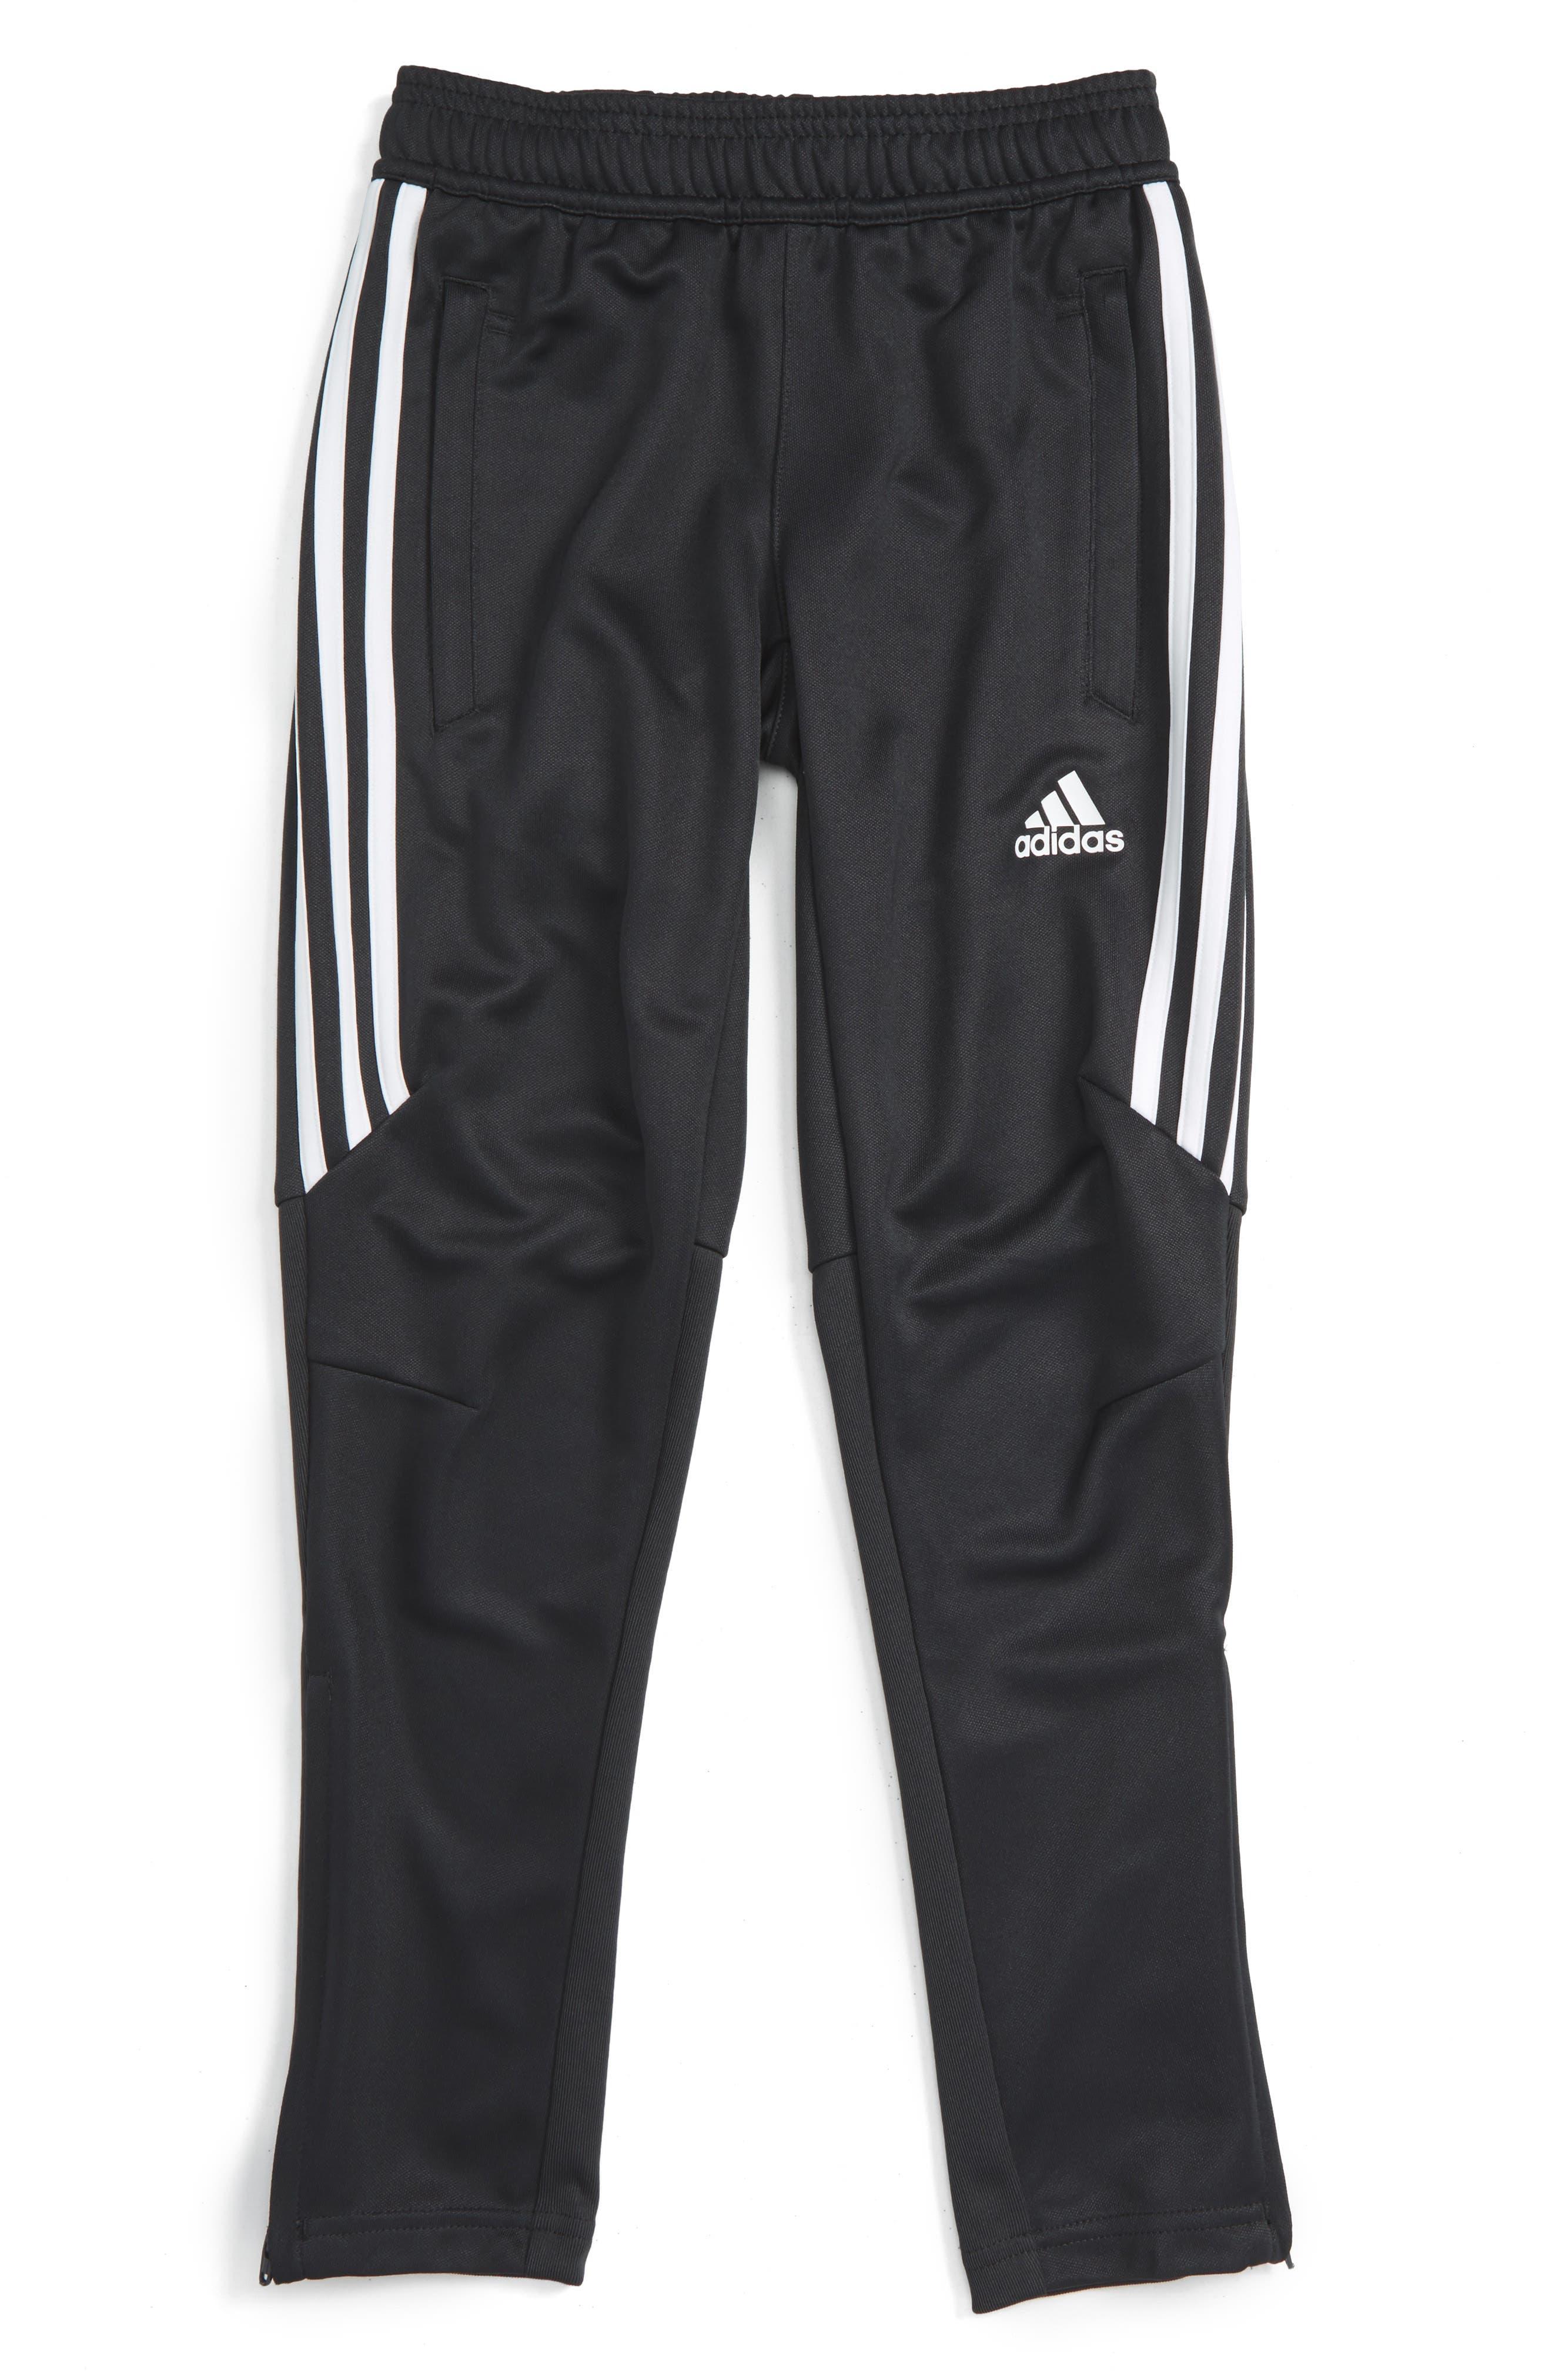 adidas Tiro 17 Training Pants (Little Boys & Big Boys)